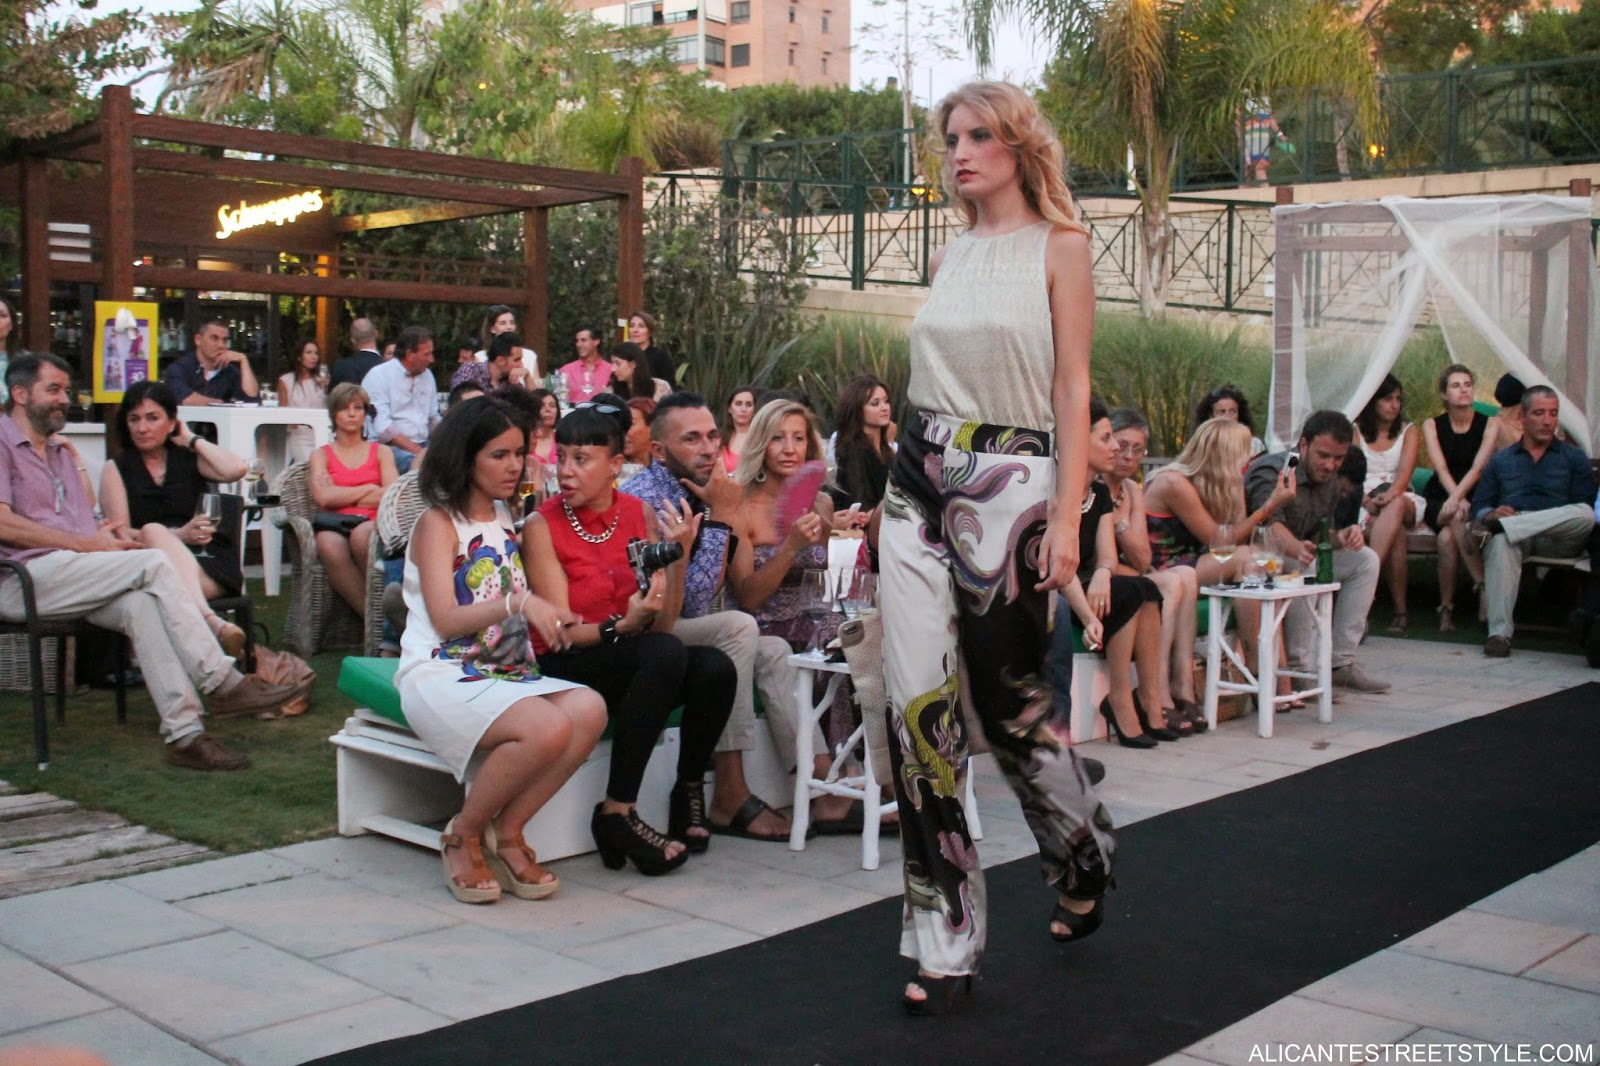 http://www.alicantestreetstyle.com/2014/07/caso-de-exito-de-la-moda-alicantina.html